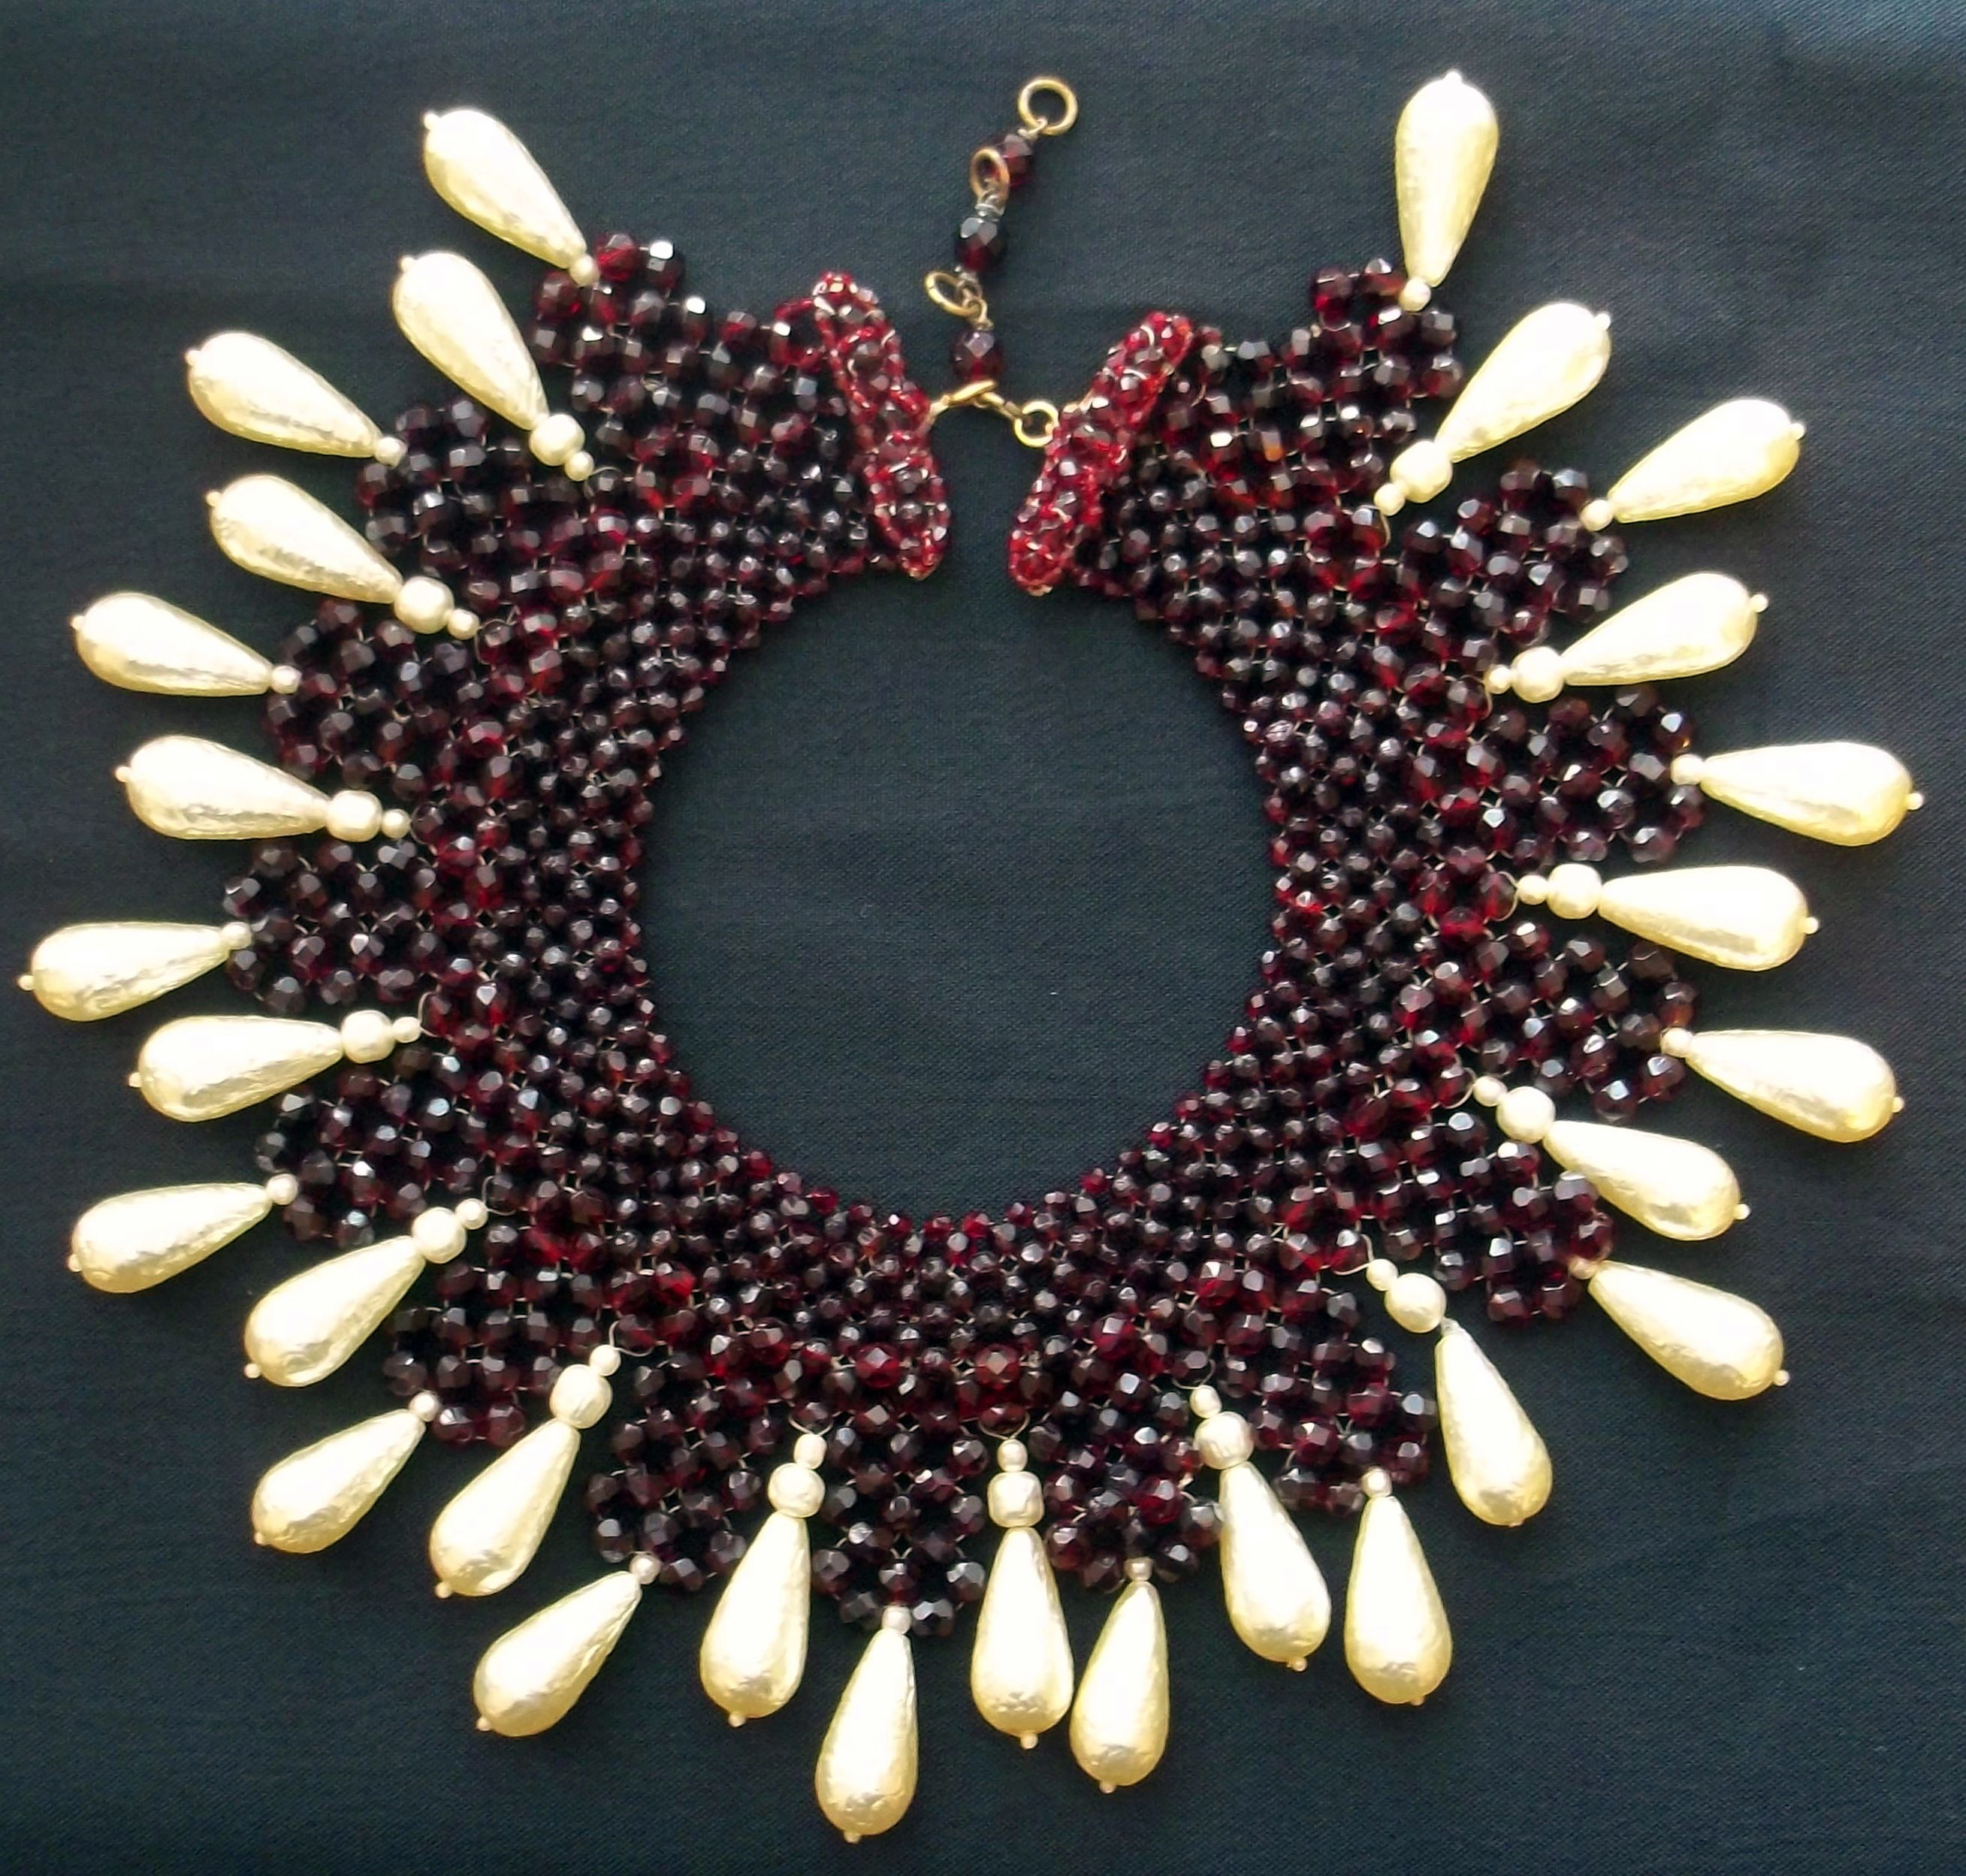 Coppola e Topo - Collier 'Pampilles' - Perles et Grenats Imitation